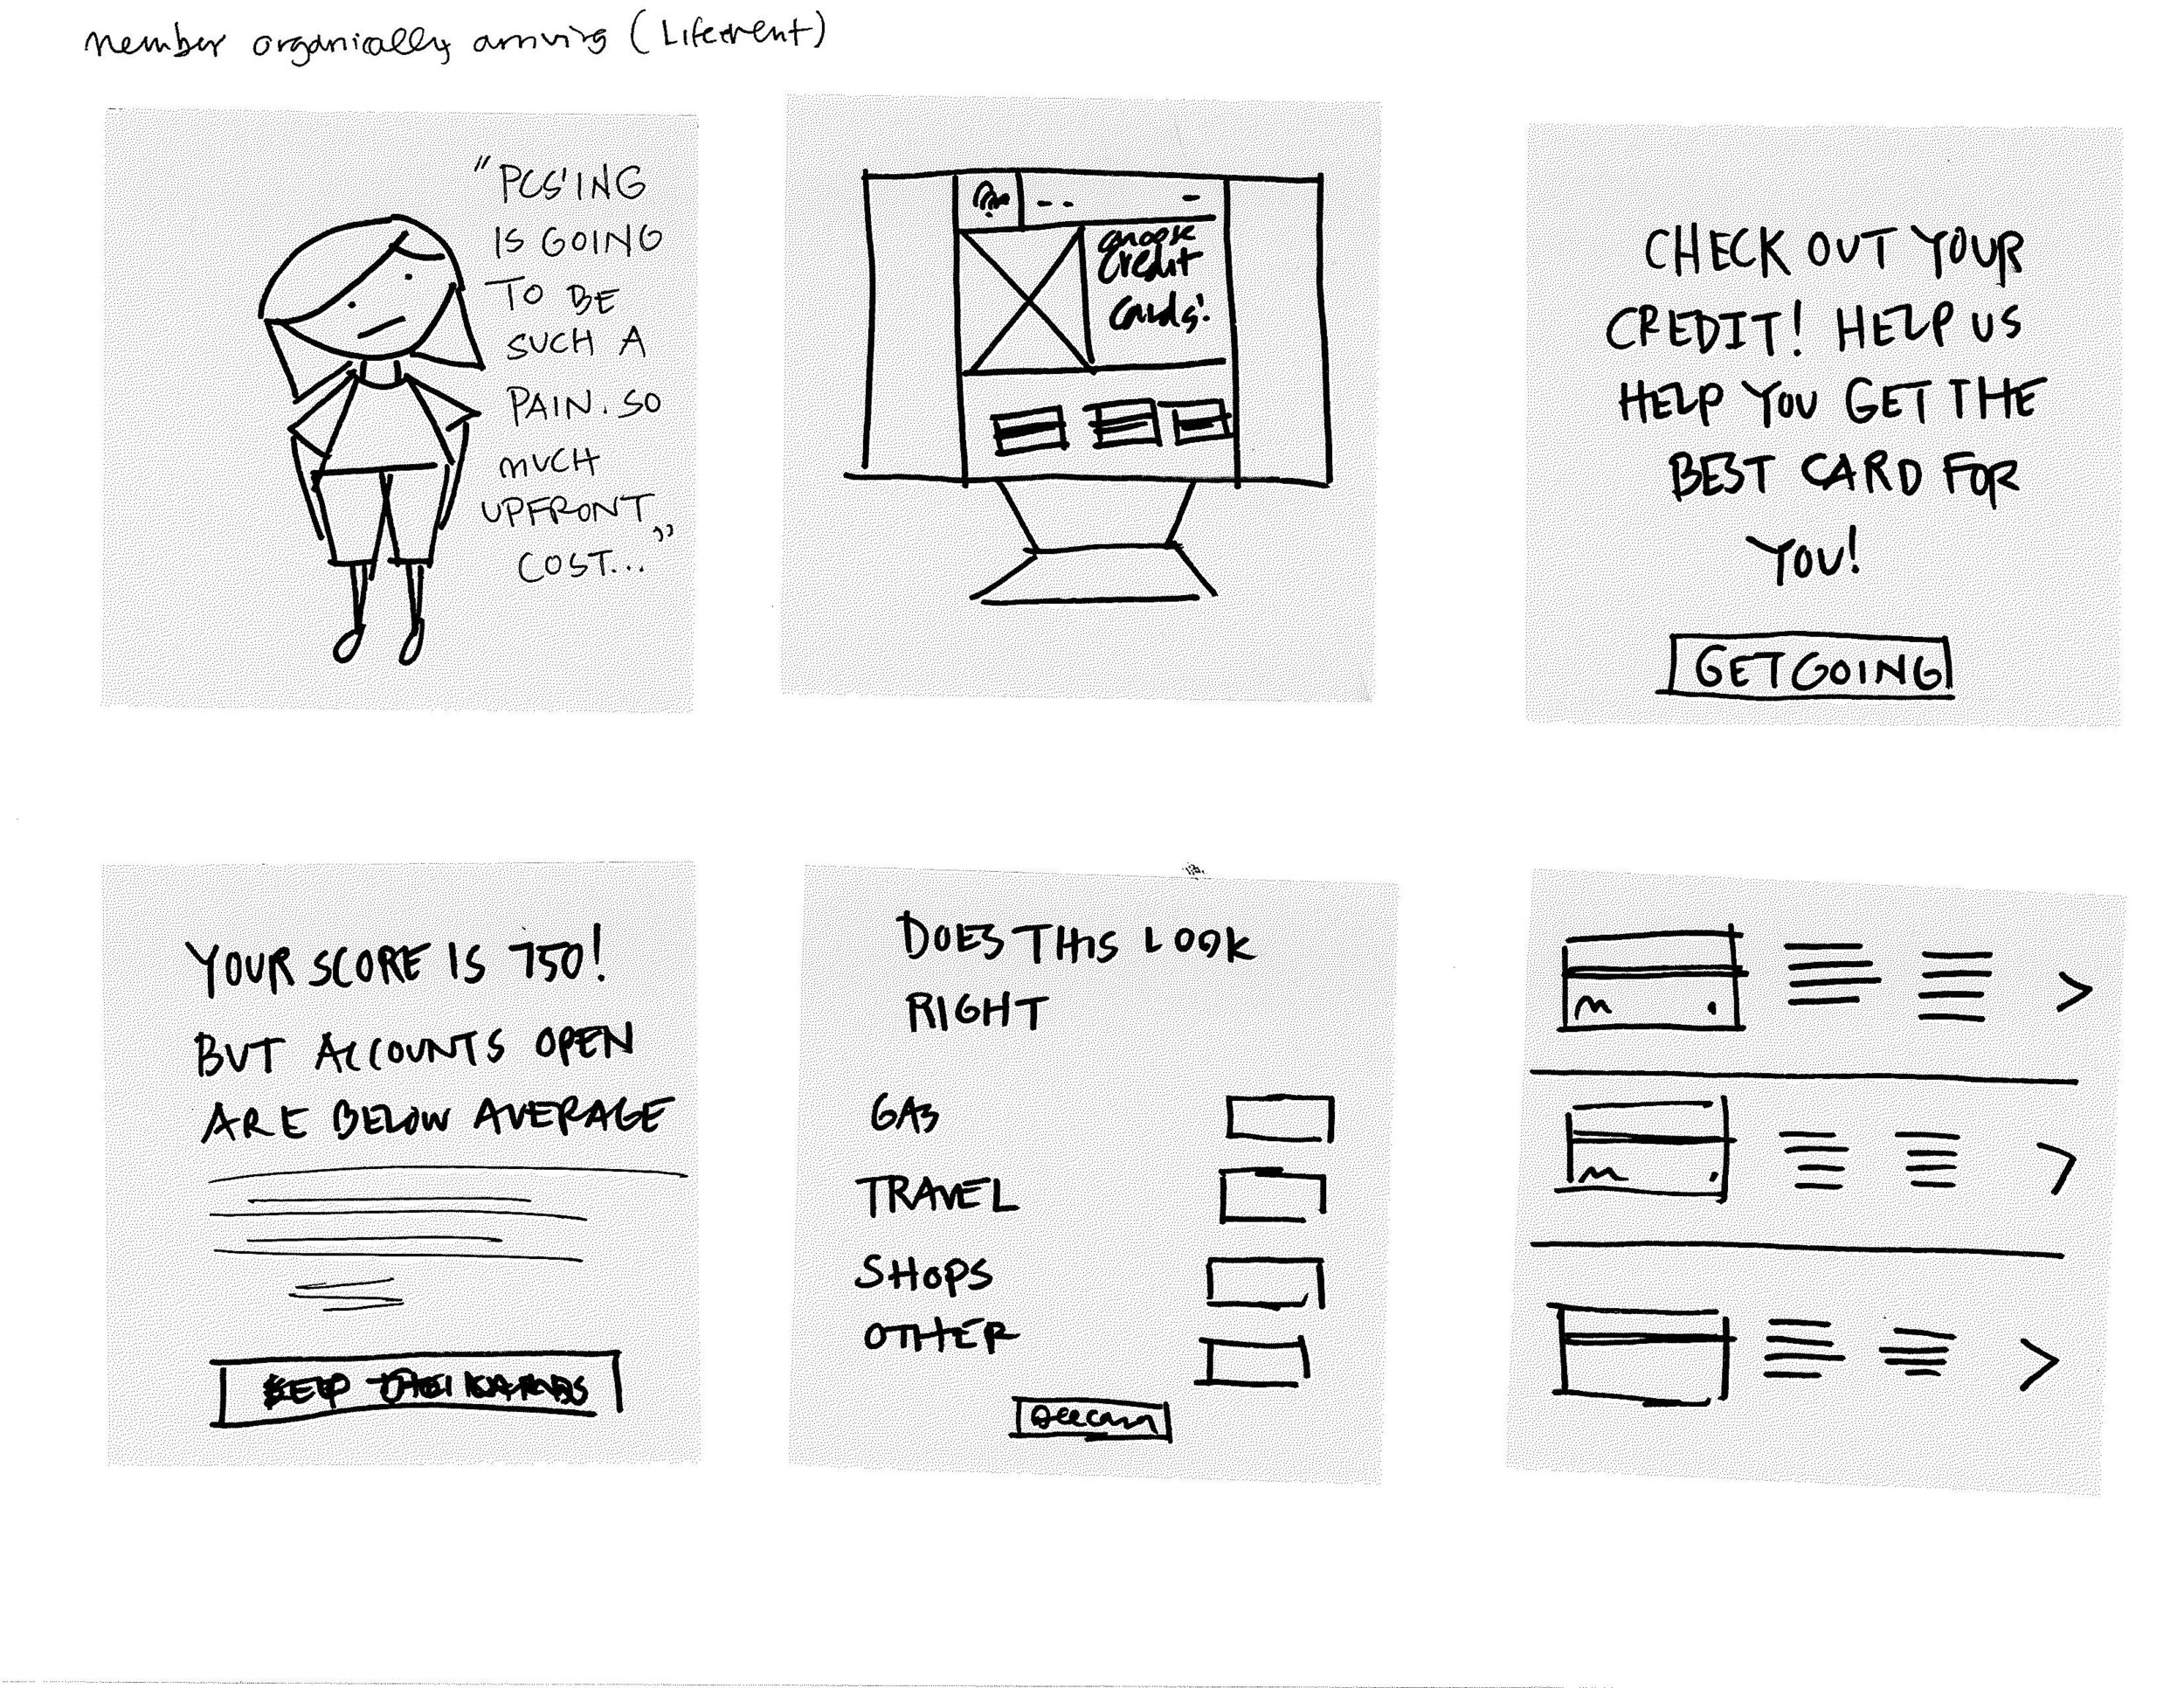 Concept02_MemberOrganicallyArrive_cs_Page_1.jpg